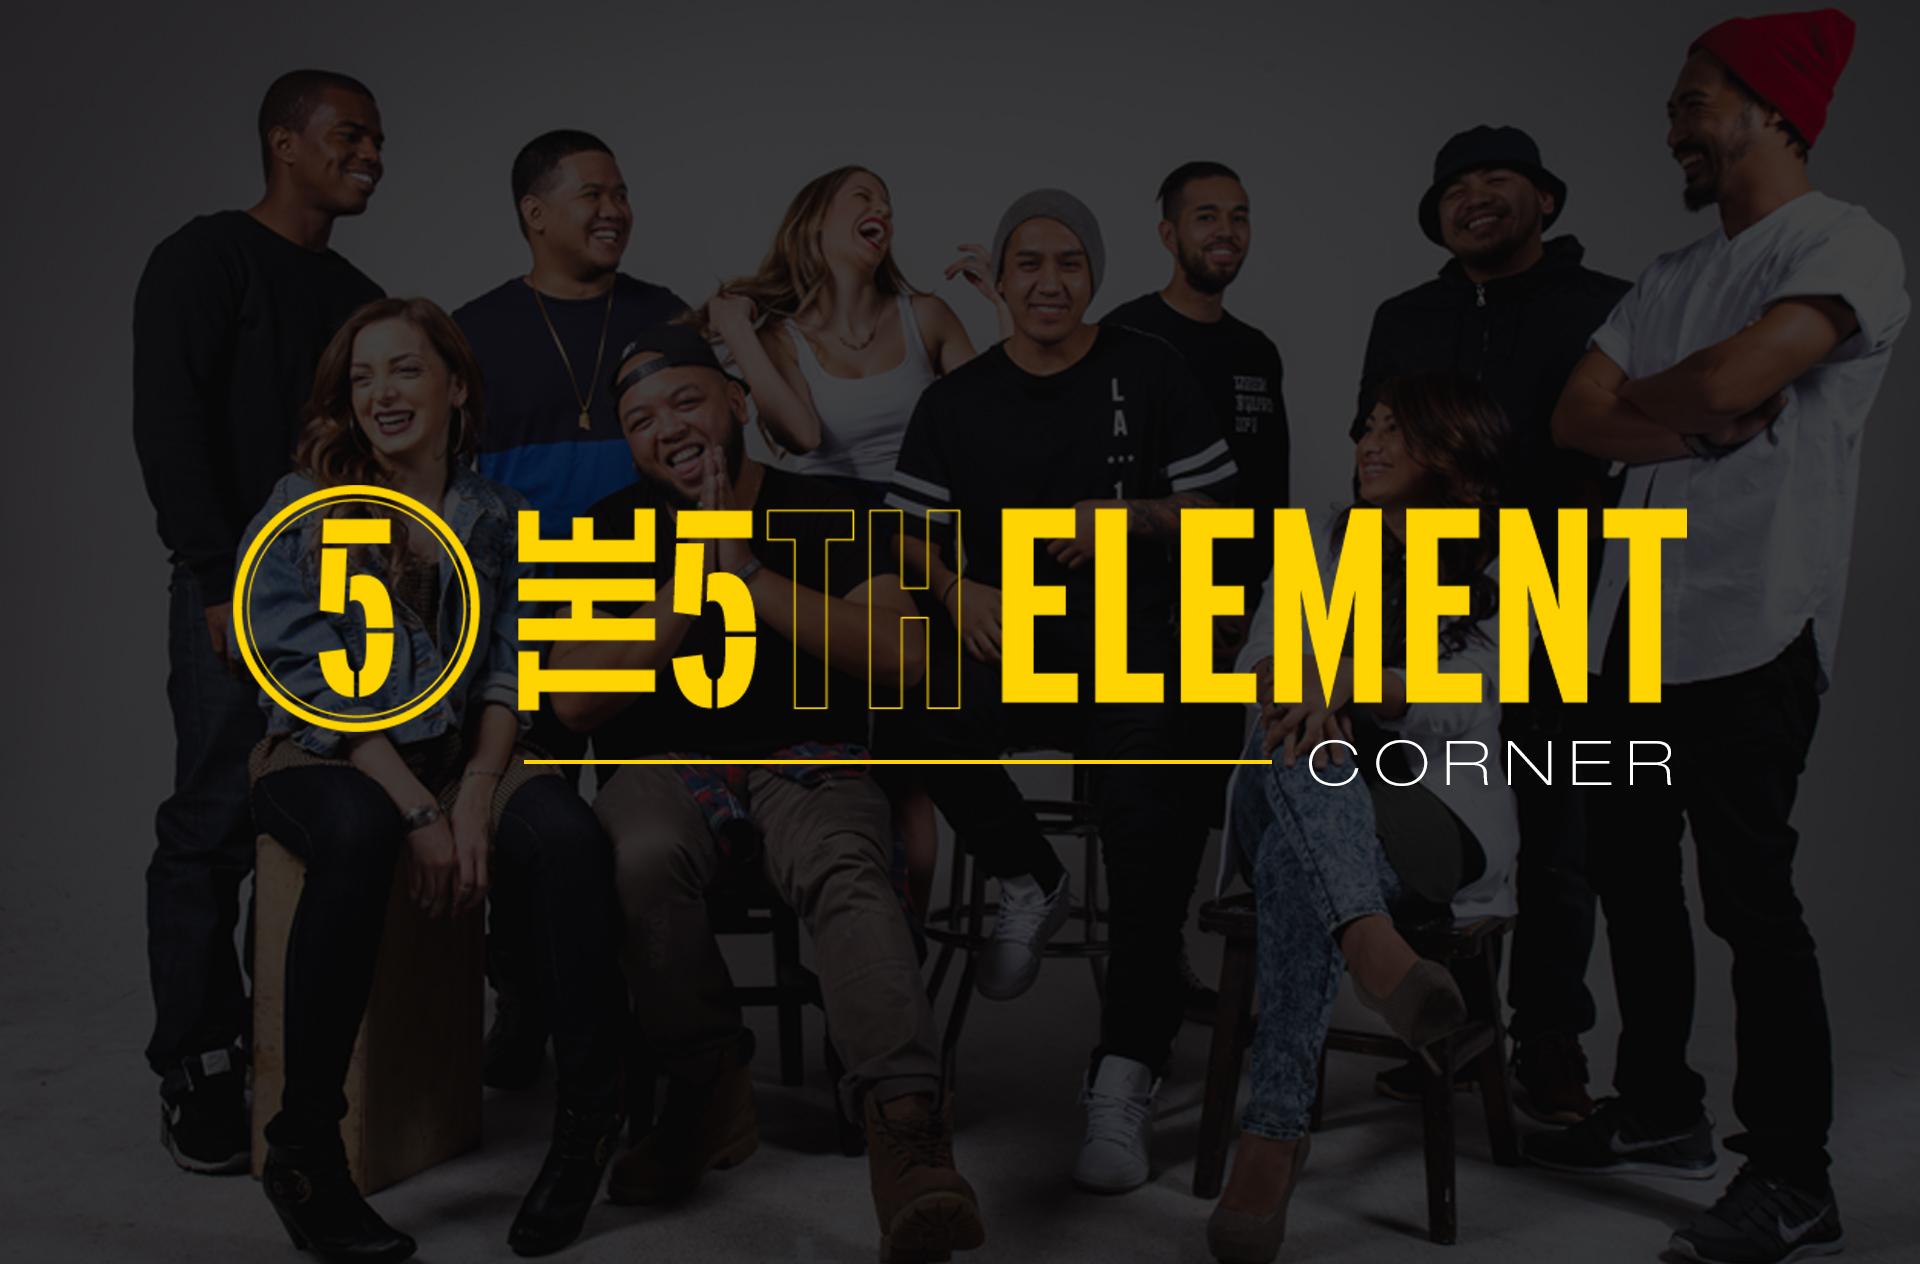 5th Element Corner